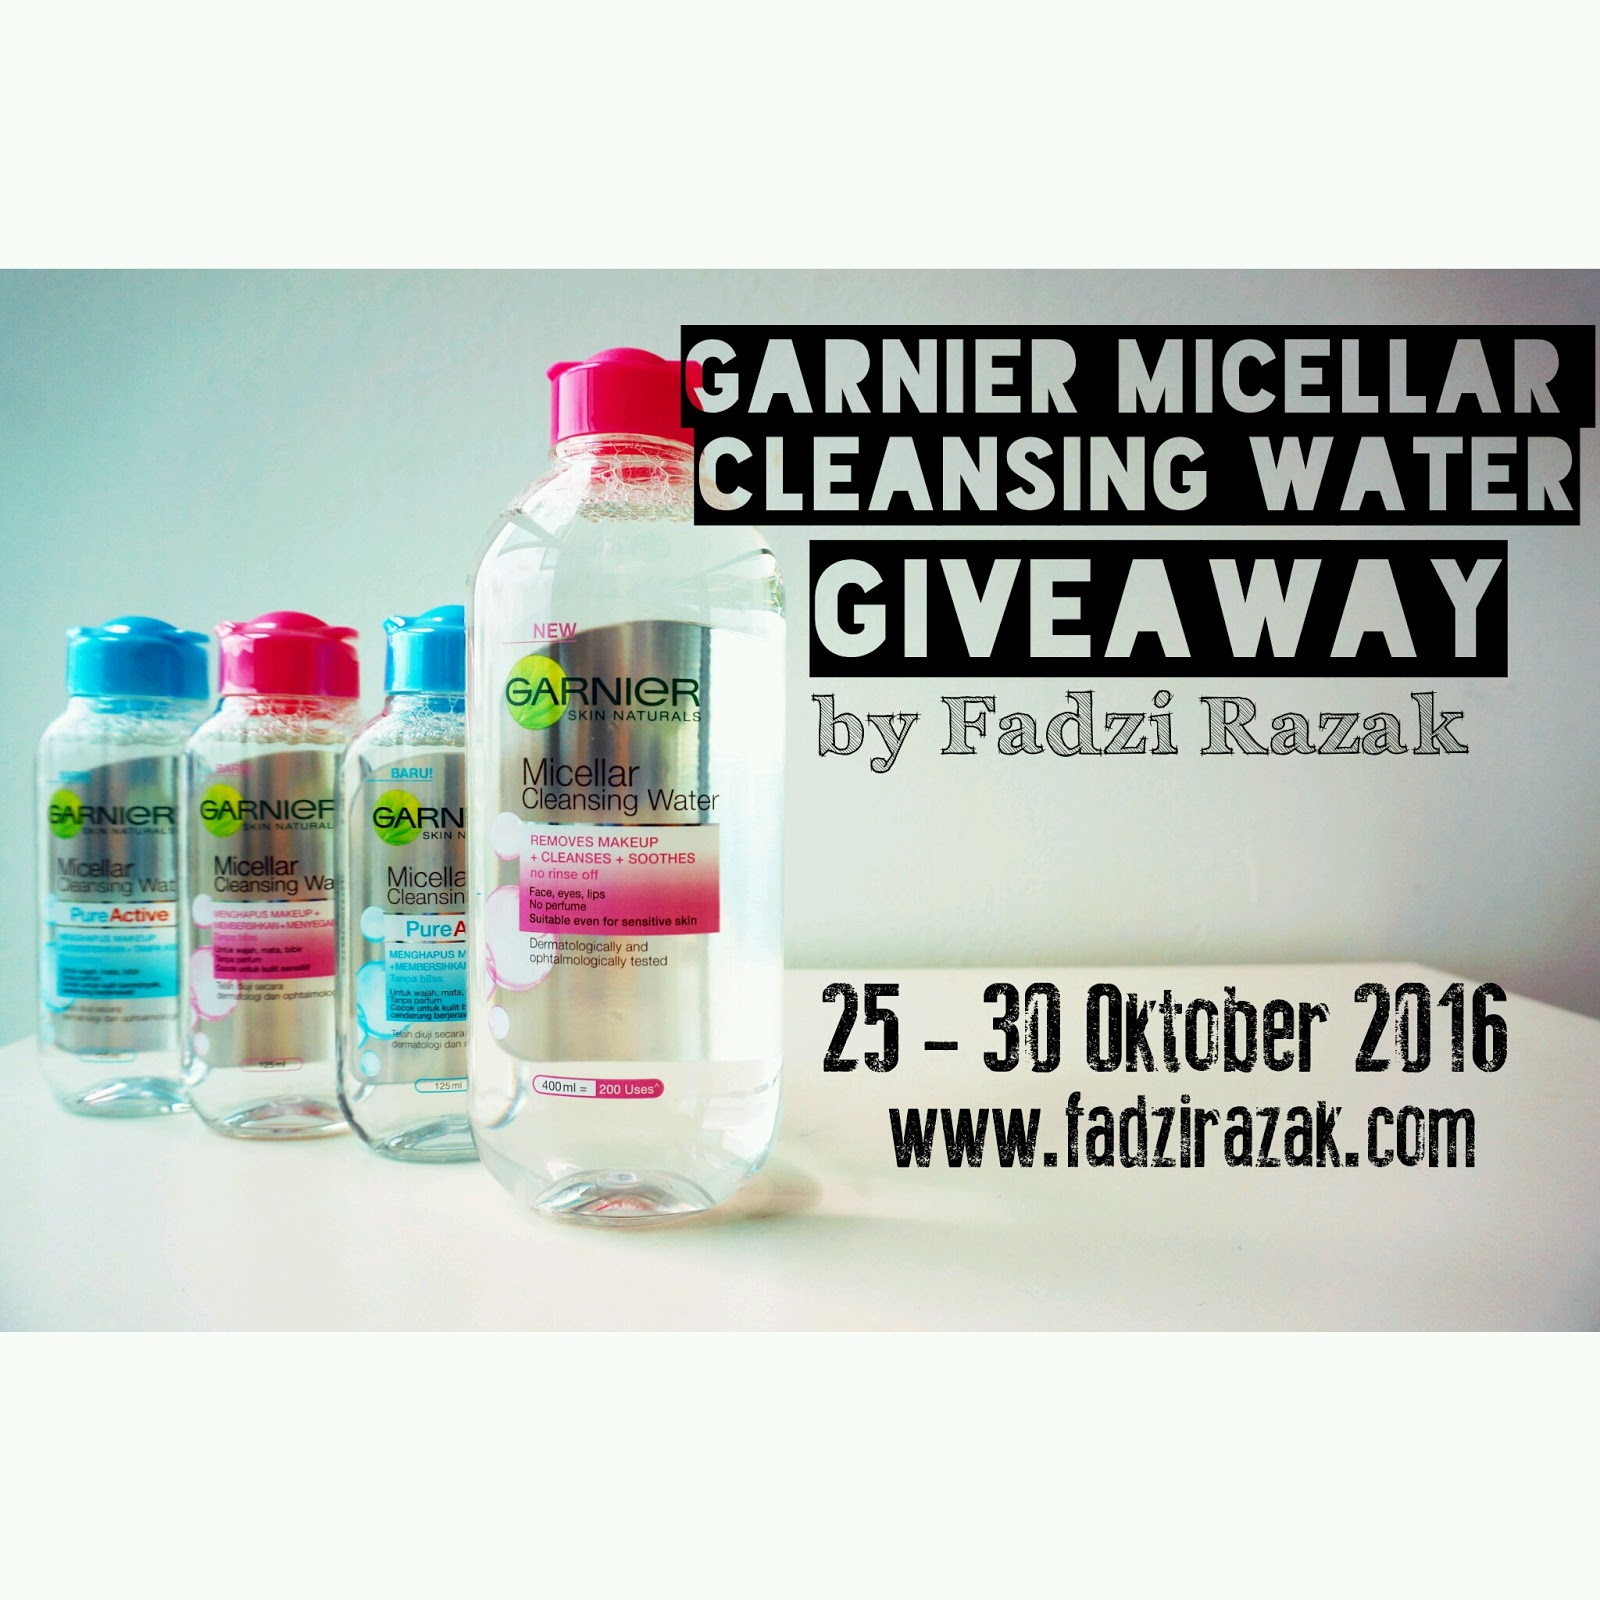 Giveaway Garnier Micellar Cleansing Water by Fadzi Razak